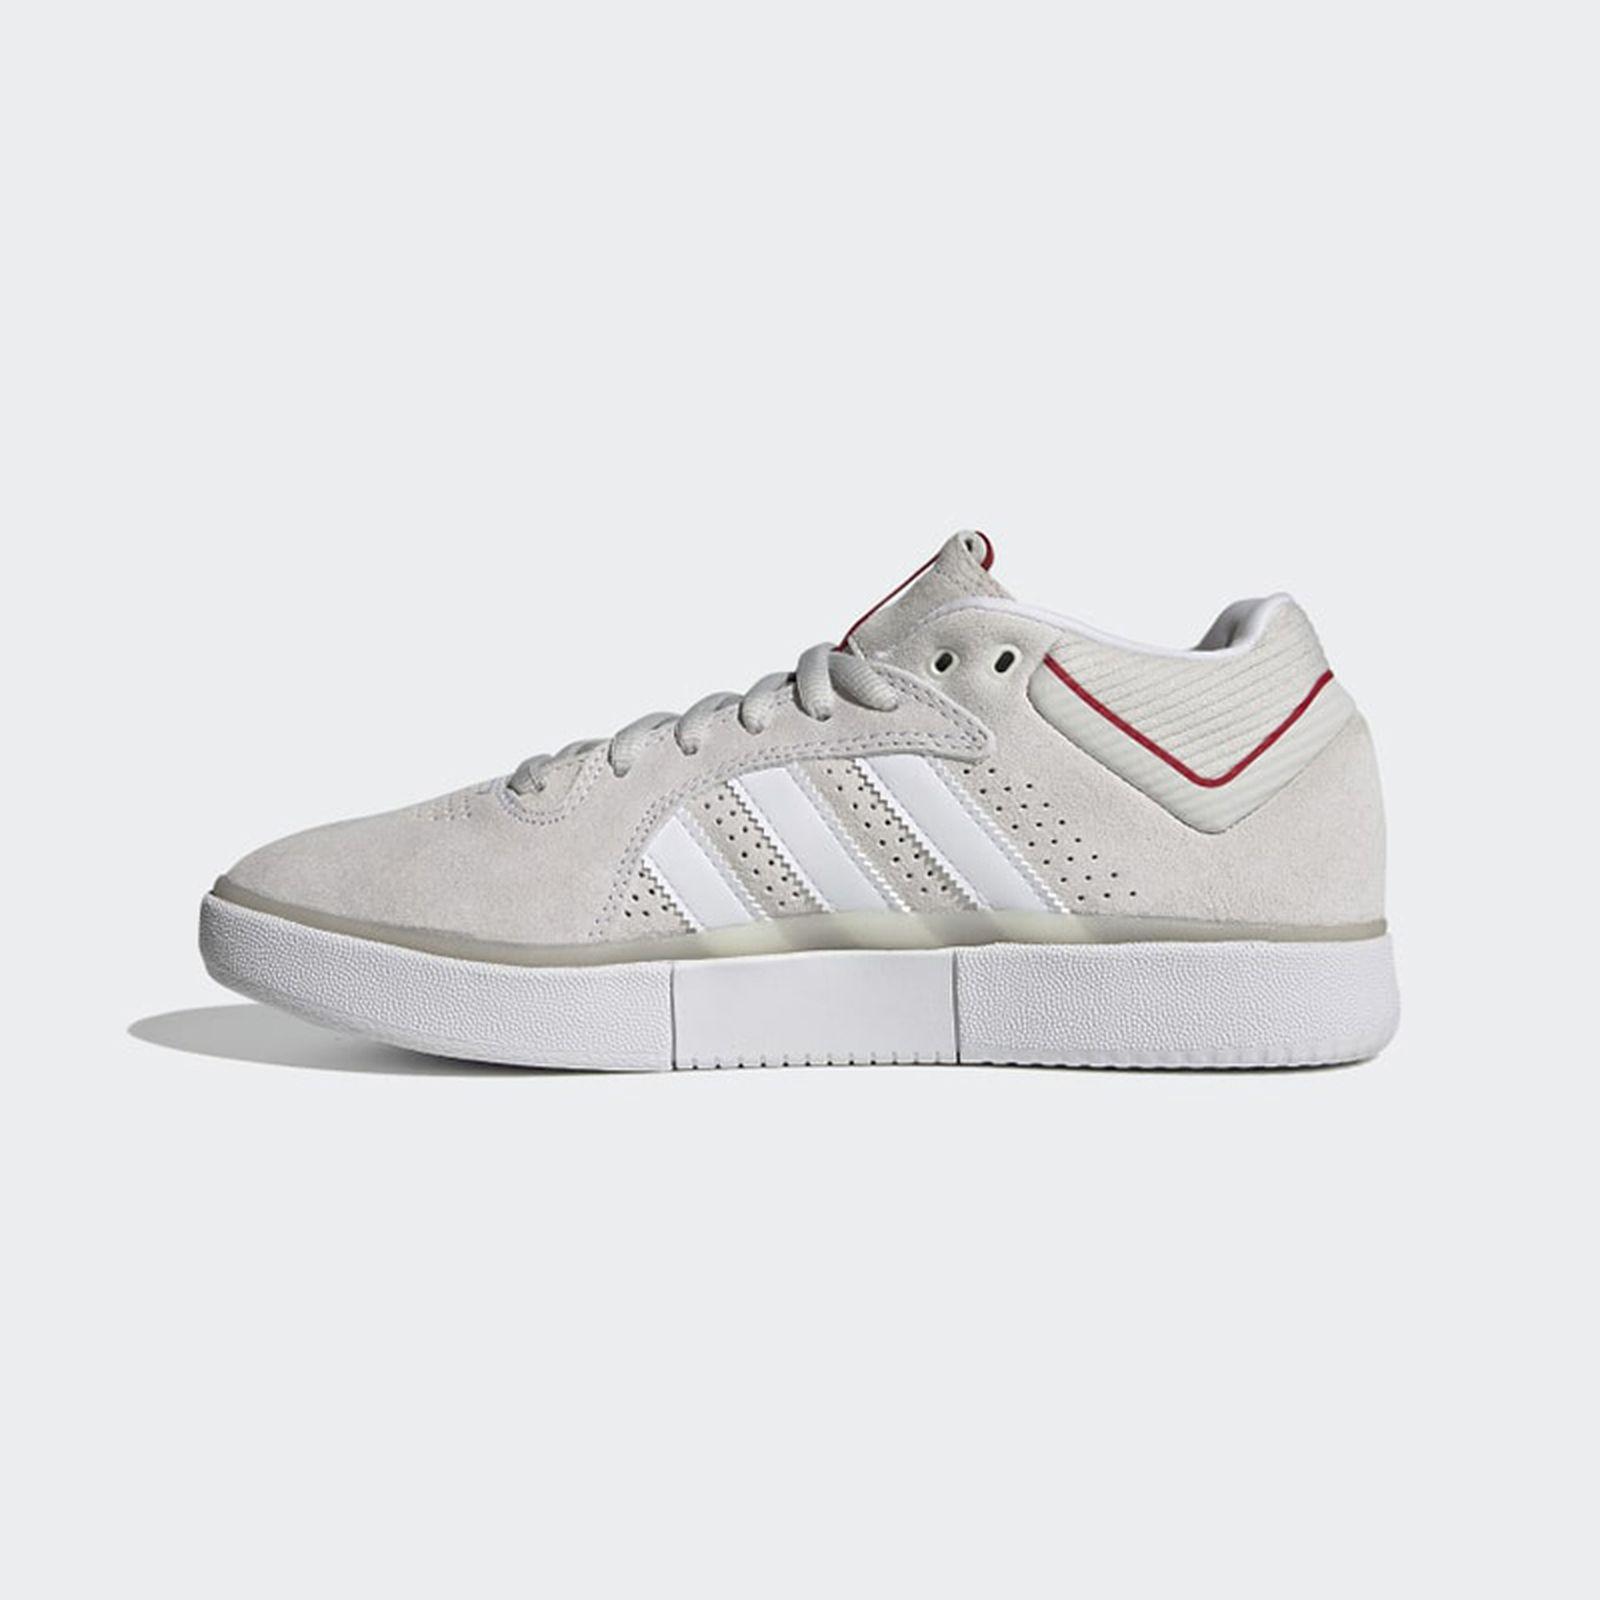 thrasher-adidas-superstar-adv-tyshawn-jones-release-date-price-1-12